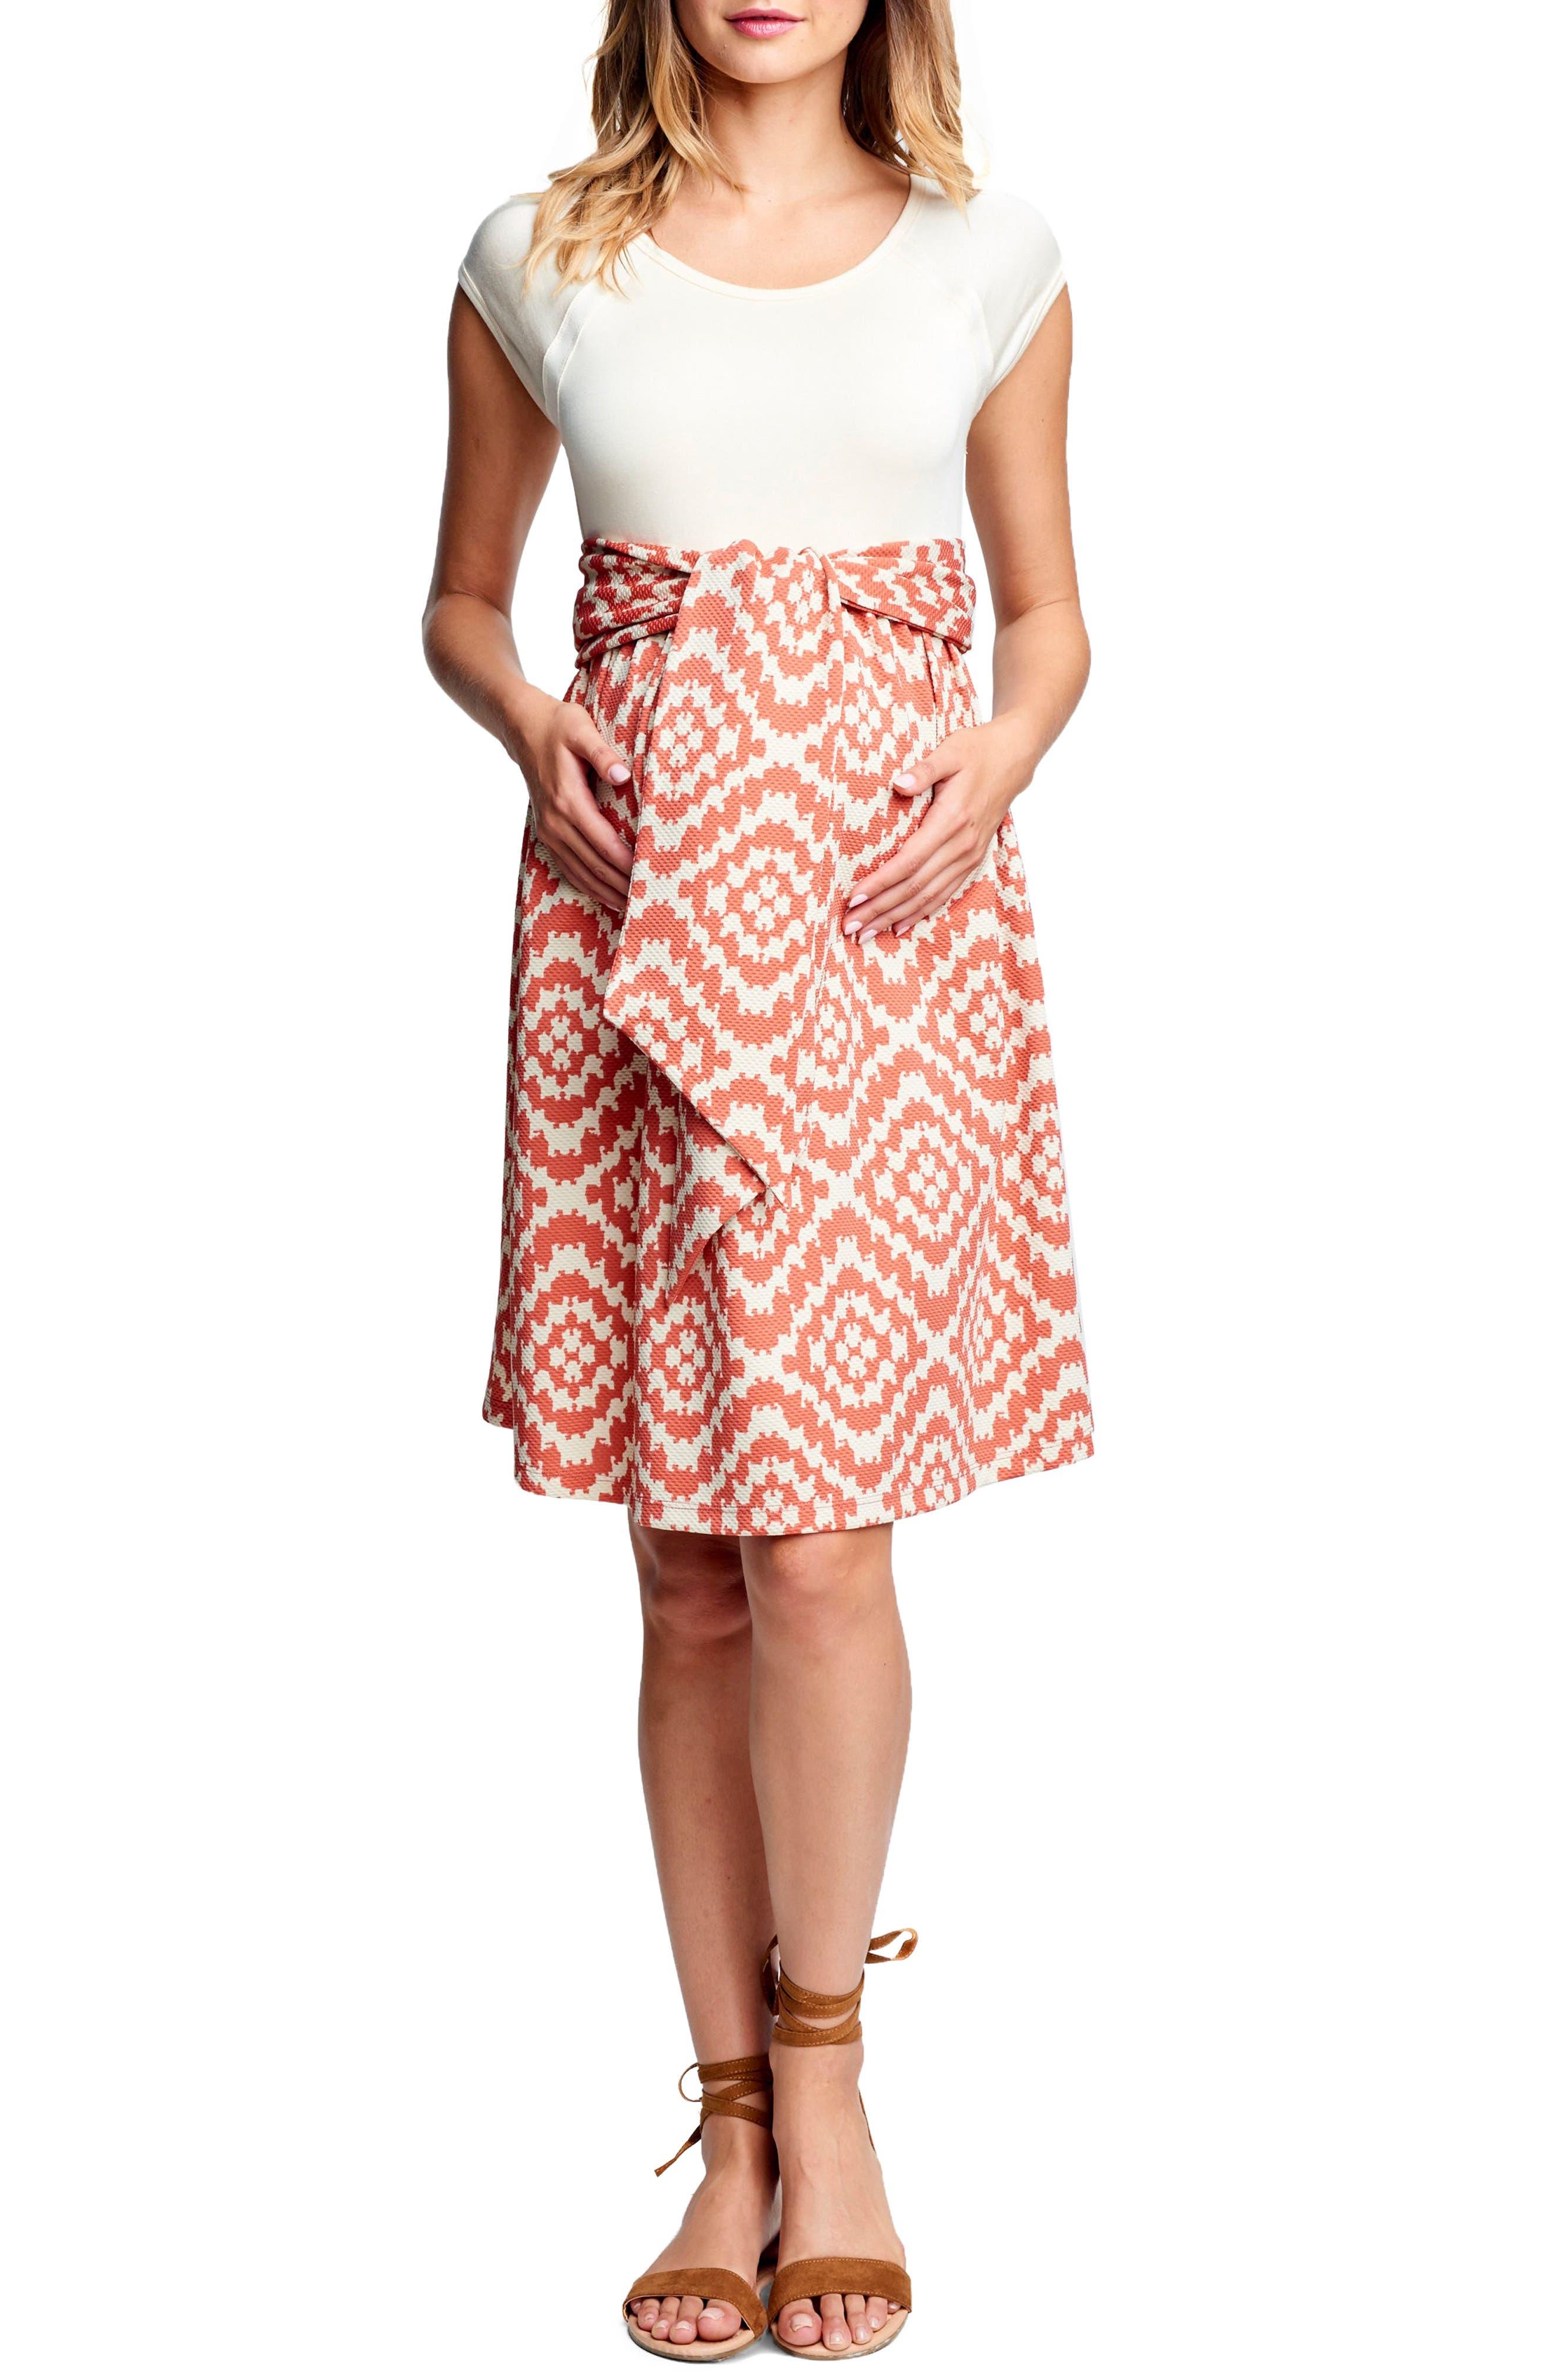 Maternal America Tie Front Maternity Dress, Ivory